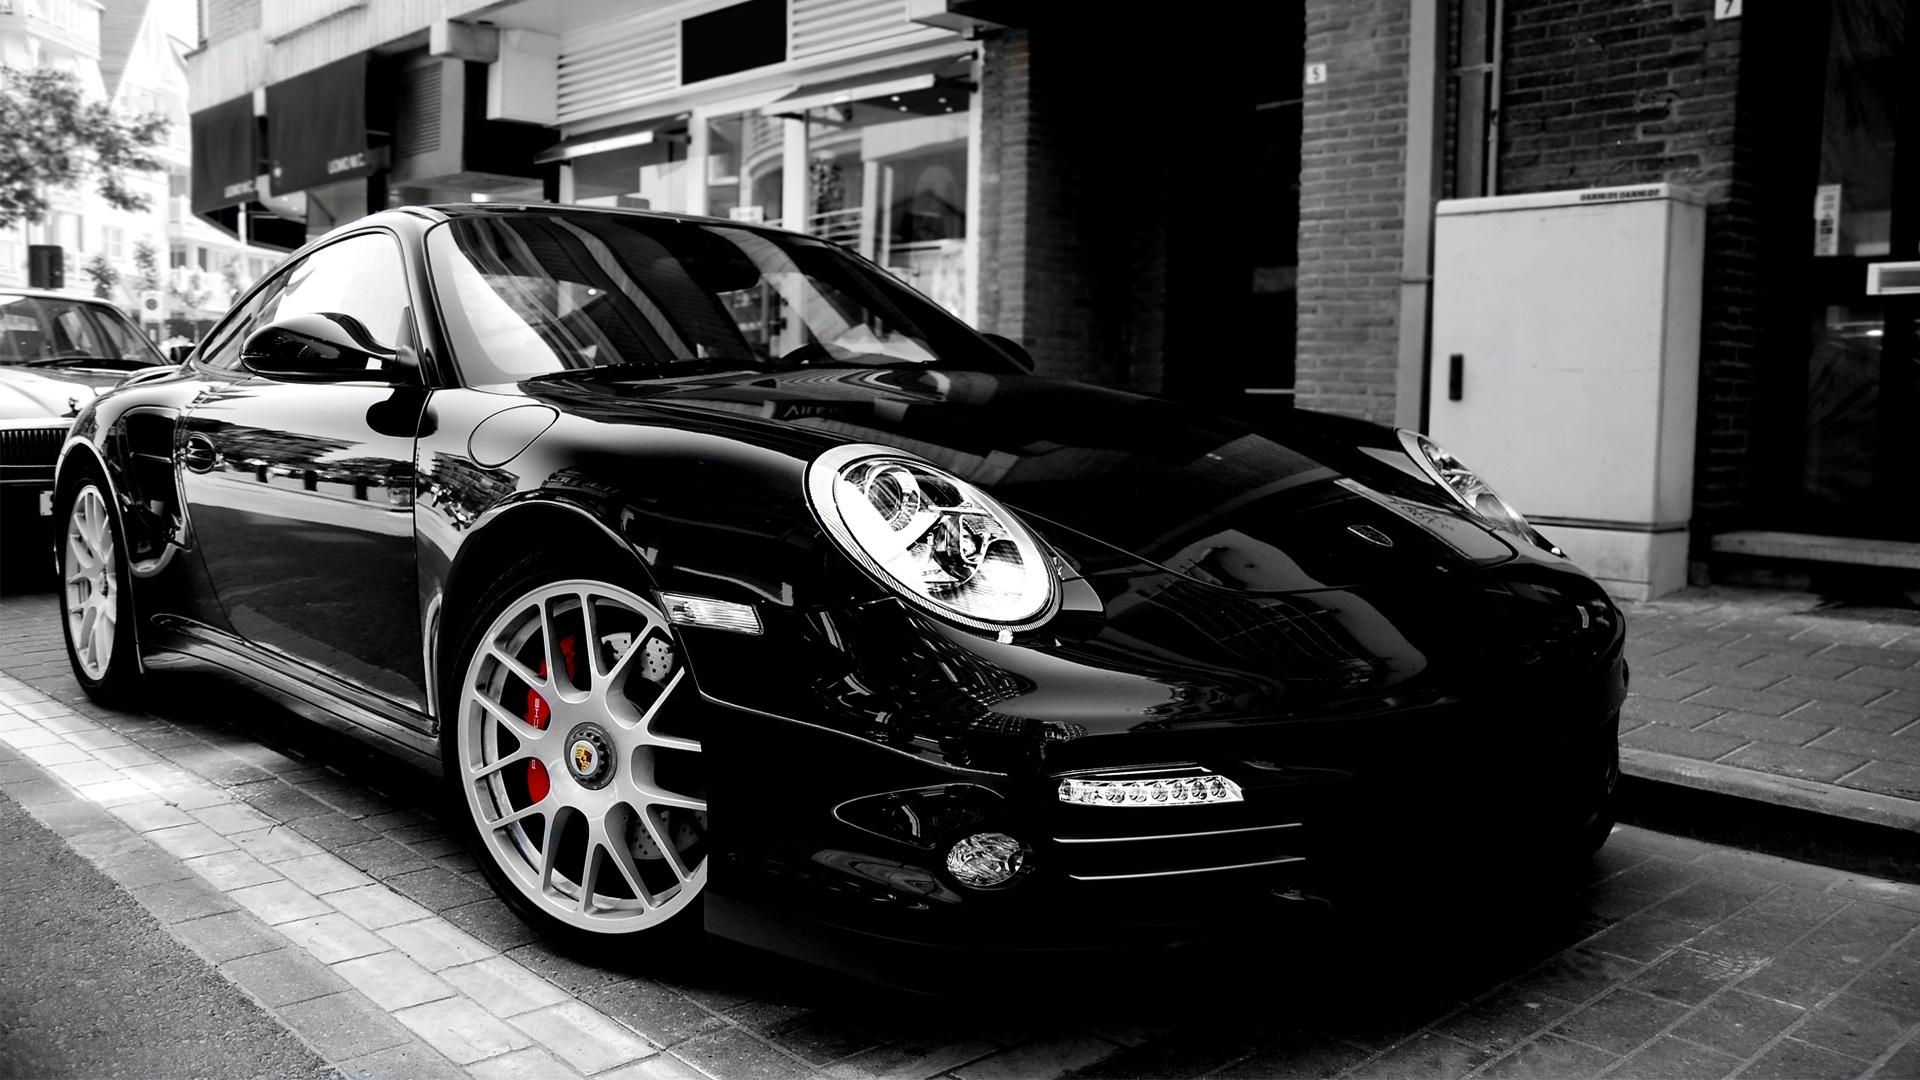 Background Car Hd Wallpapers Cities: Porsche HD Wallpapers 1080p